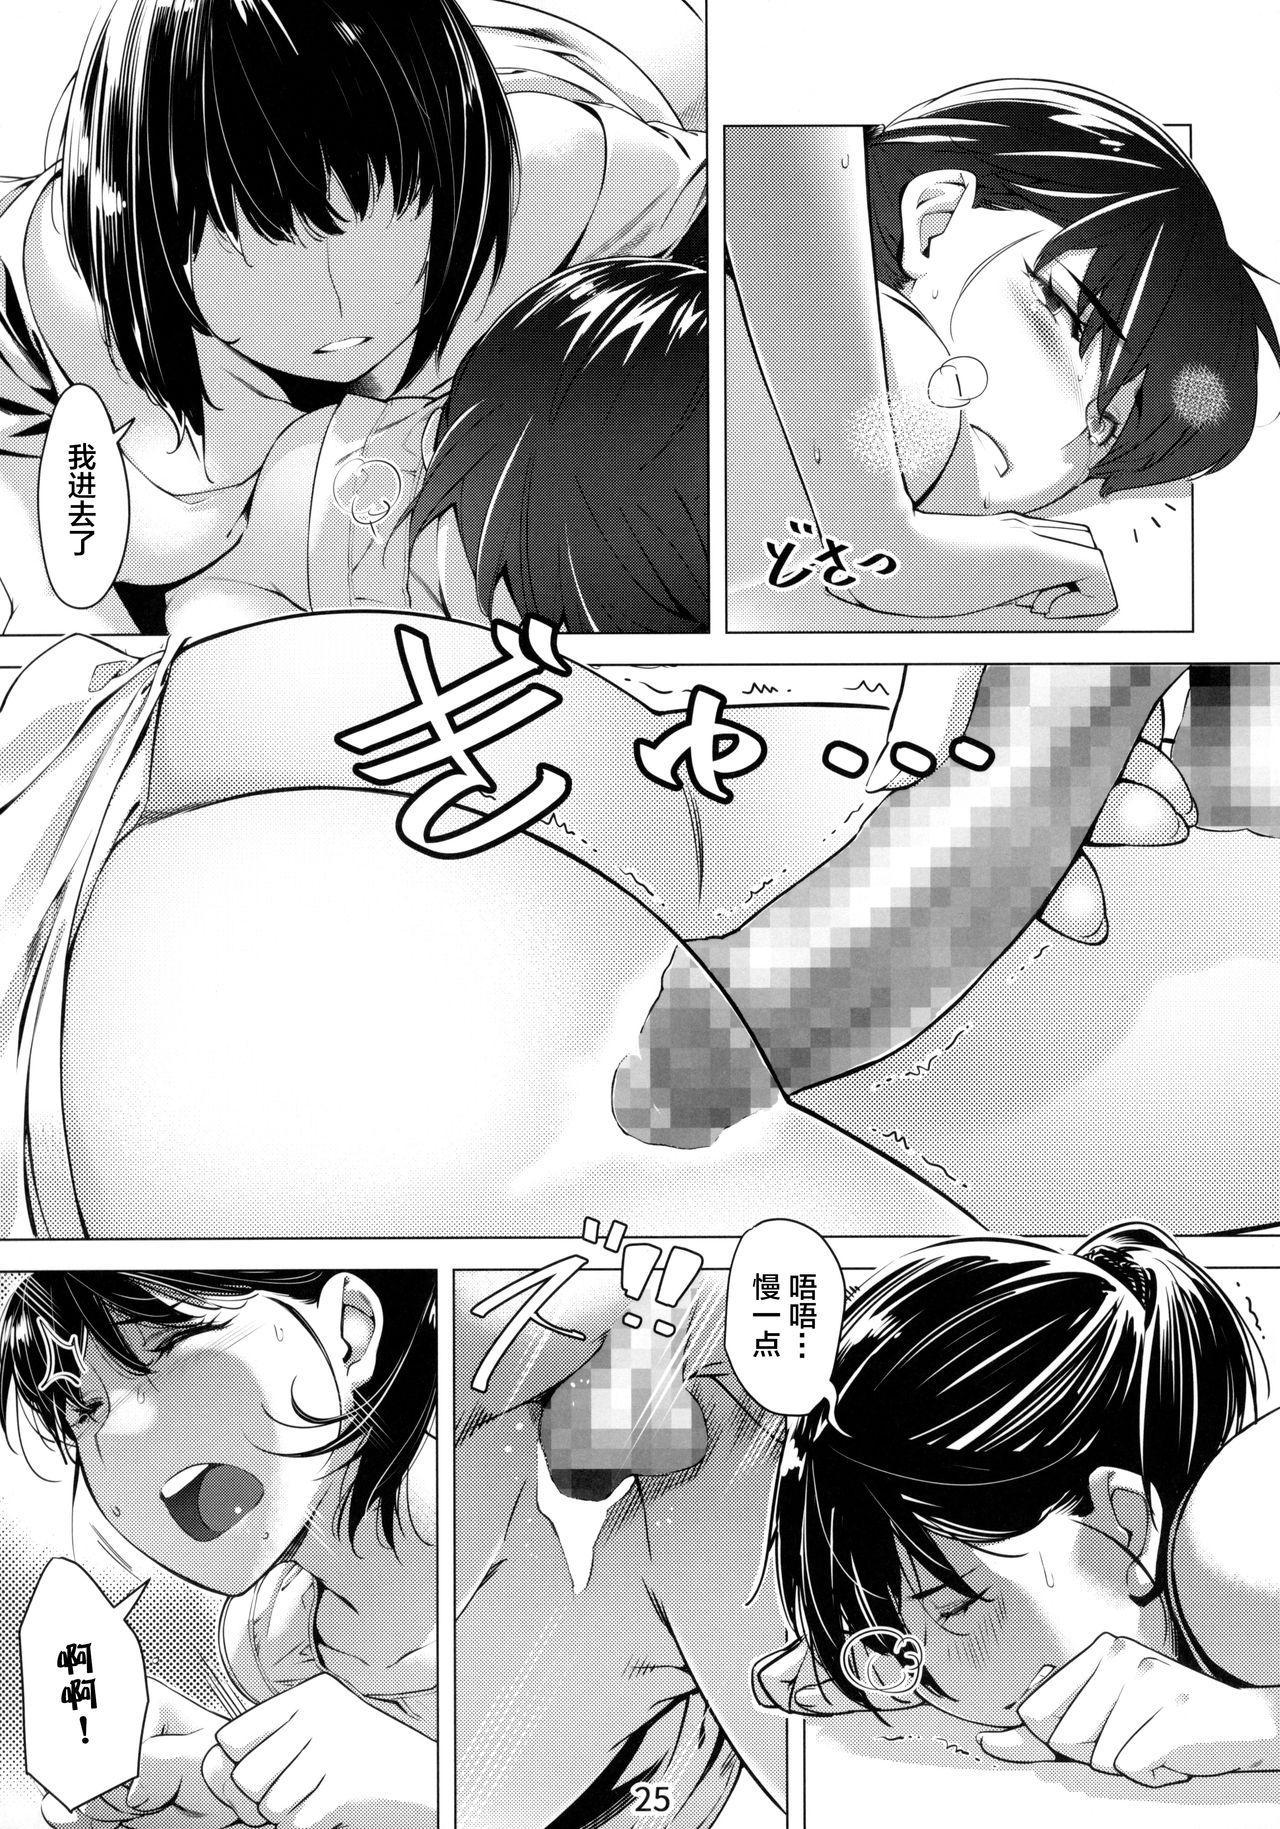 Otonano Omochiya 6 Kan 24